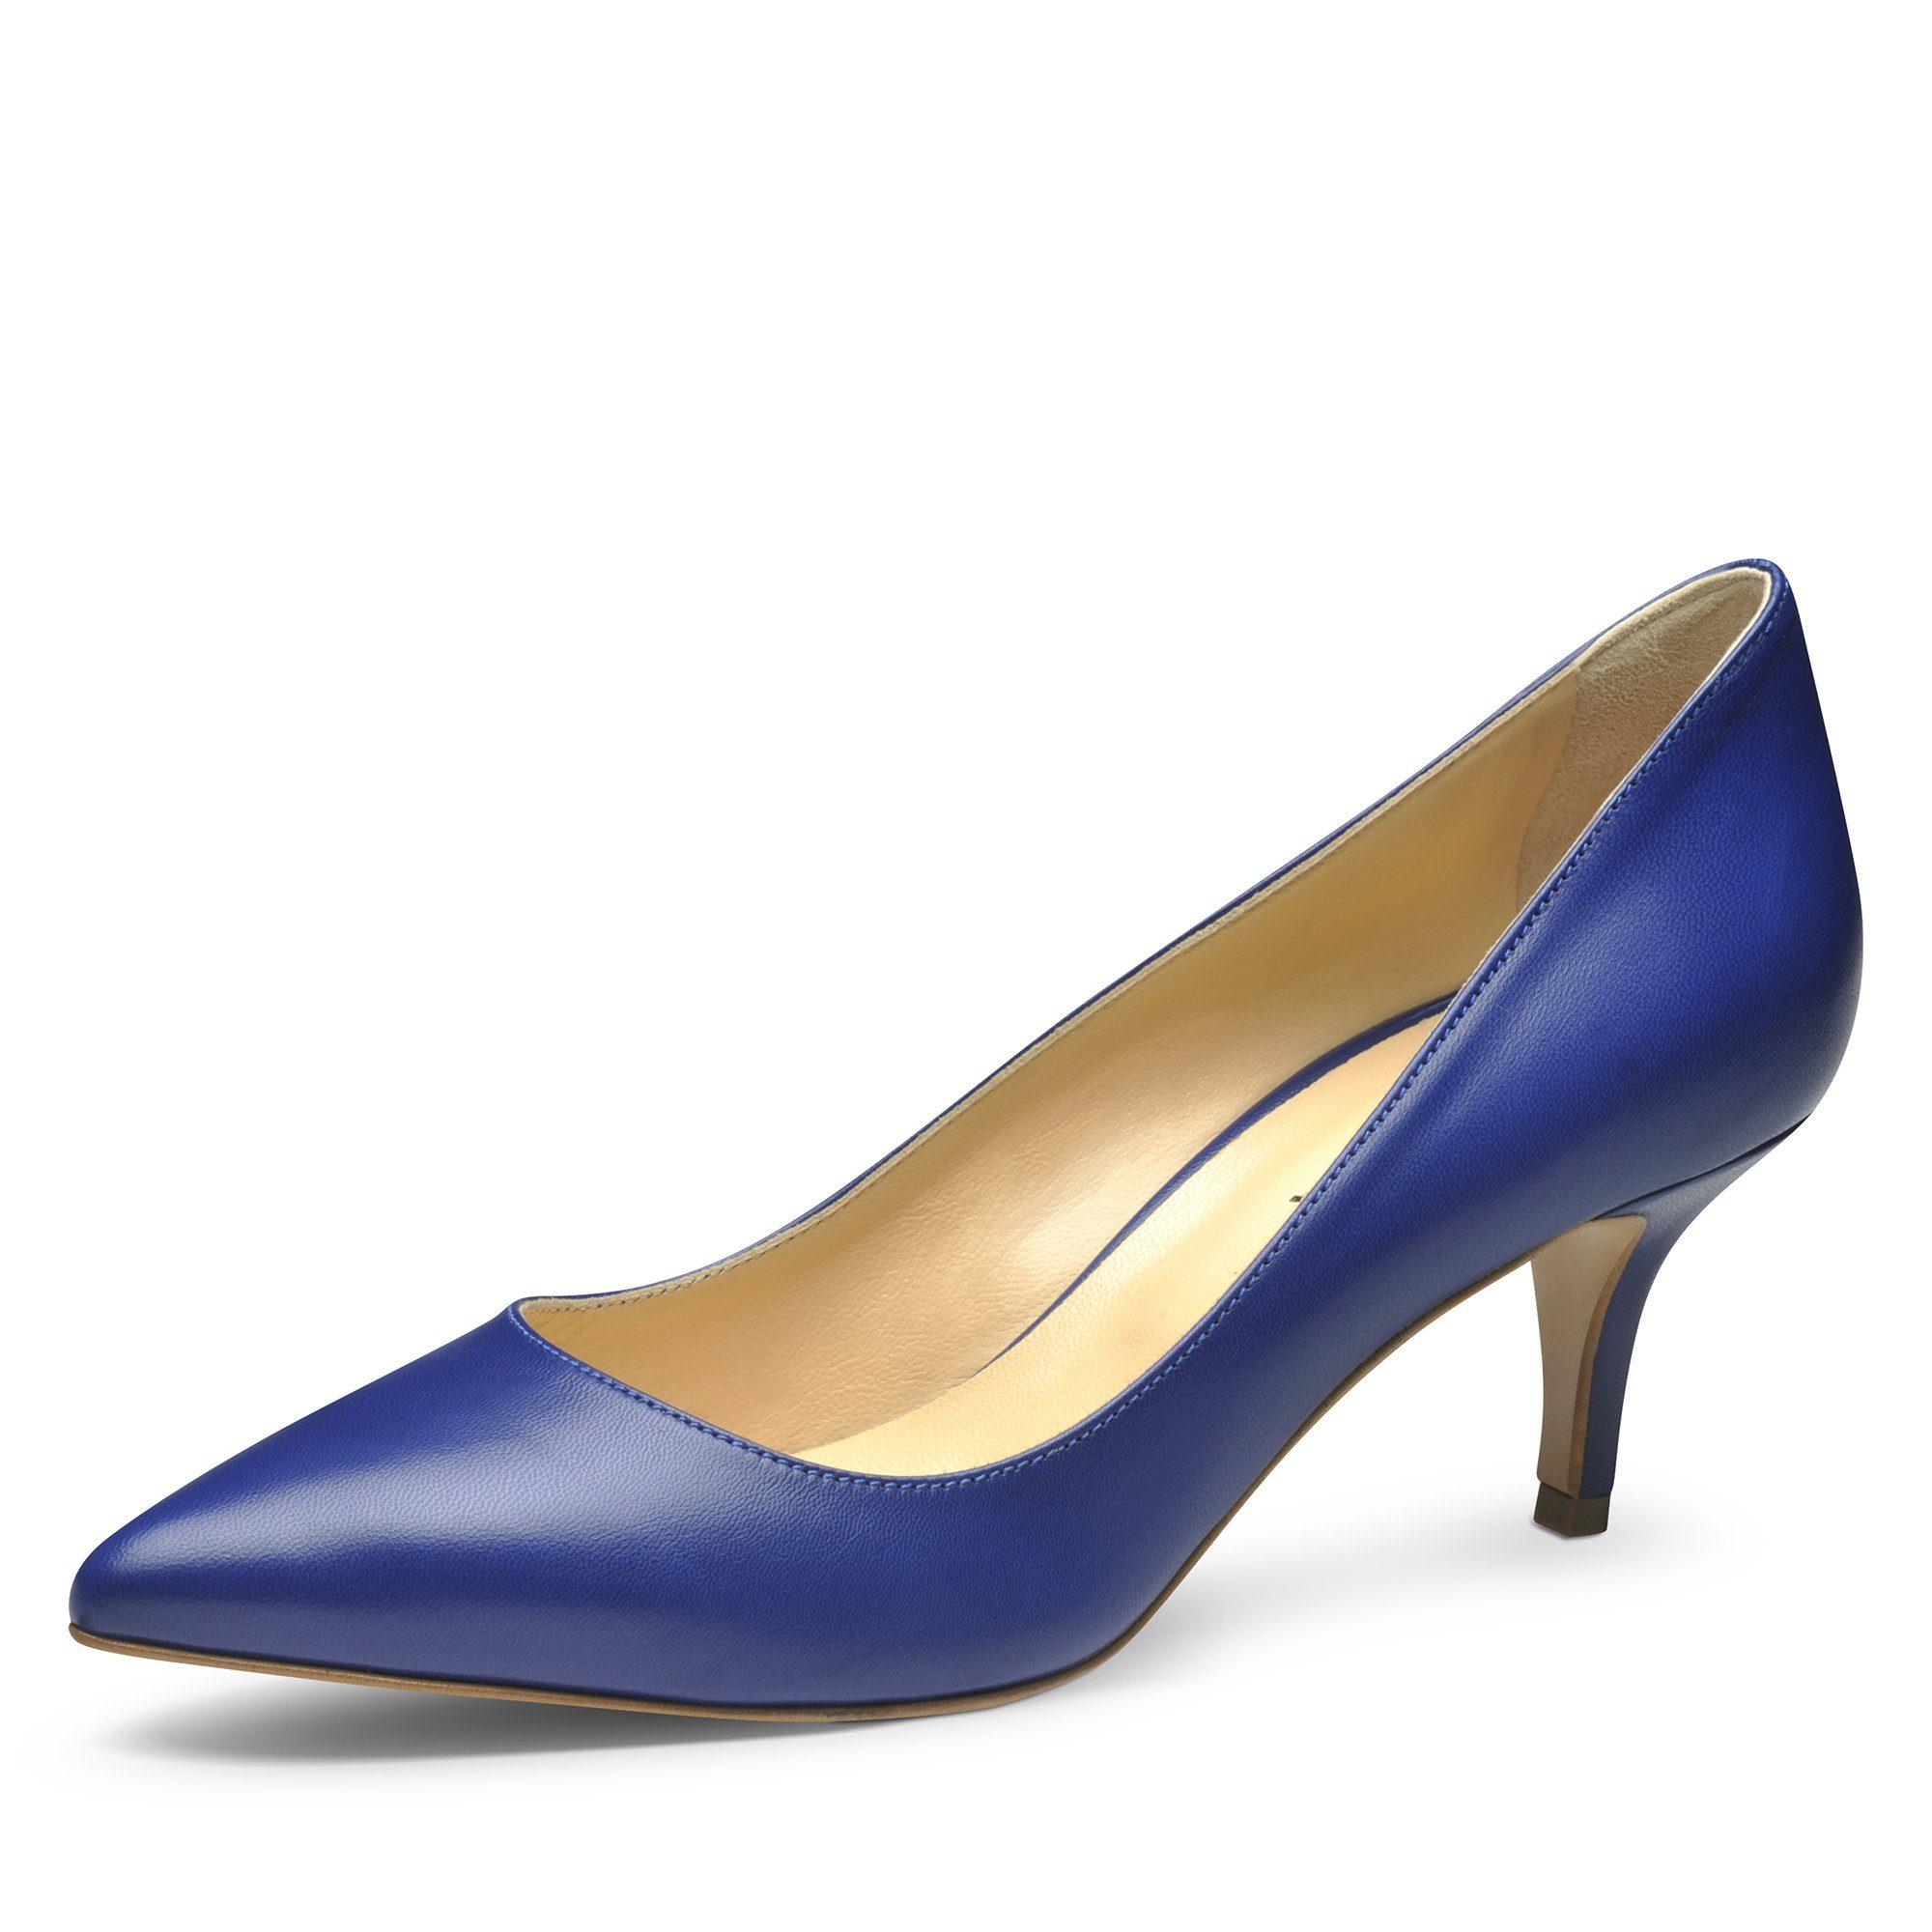 Evita GIULIA Pumps online kaufen  blau